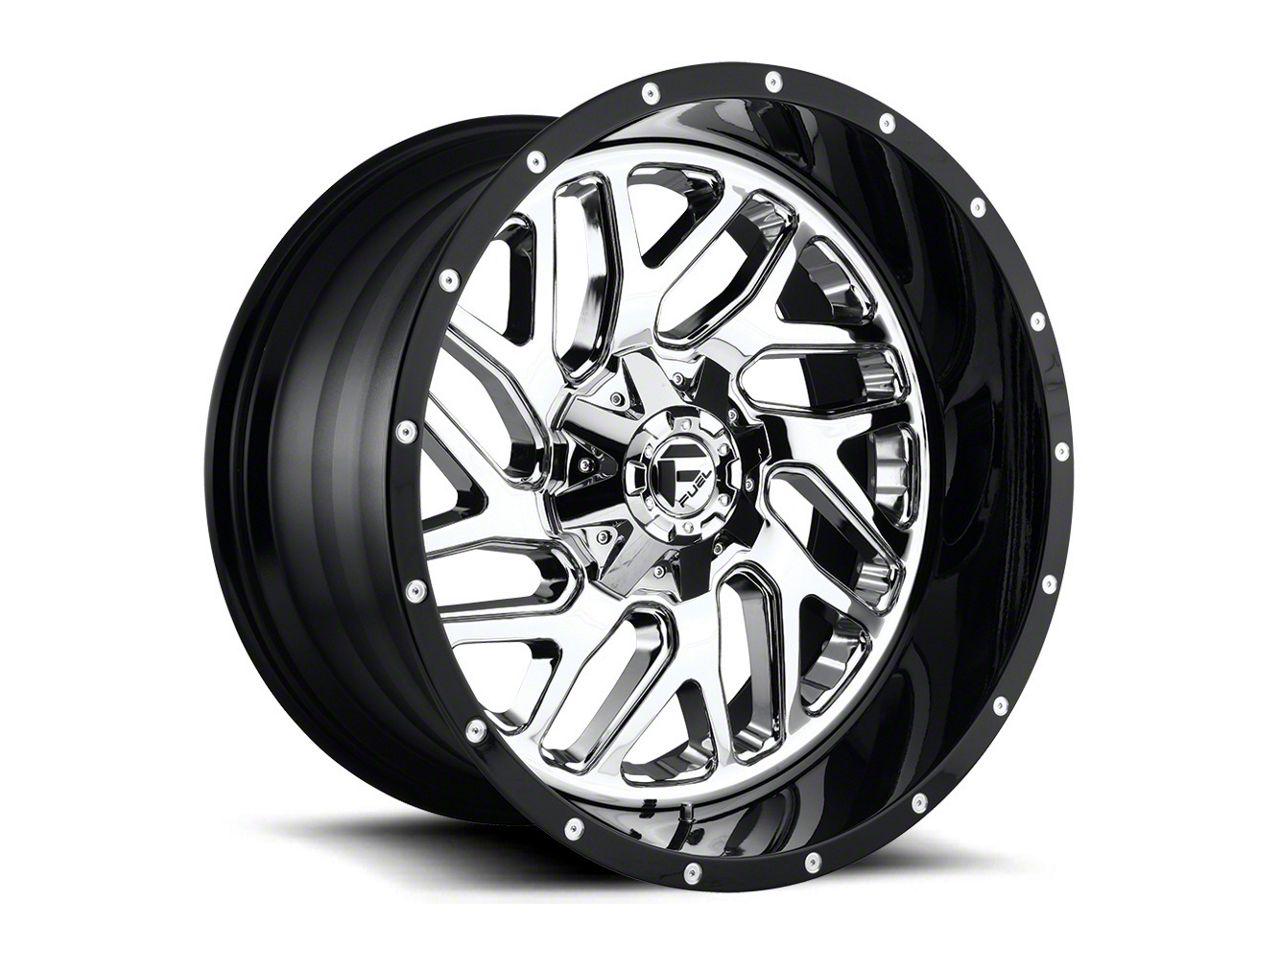 fuel wheels silverado triton chrome 6 lug wheel 22x10 d21122009850 Duramax Fuel Filter Upgrades fuel wheels triton chrome 6 lug wheel 22x10 99 19 silverado 1500